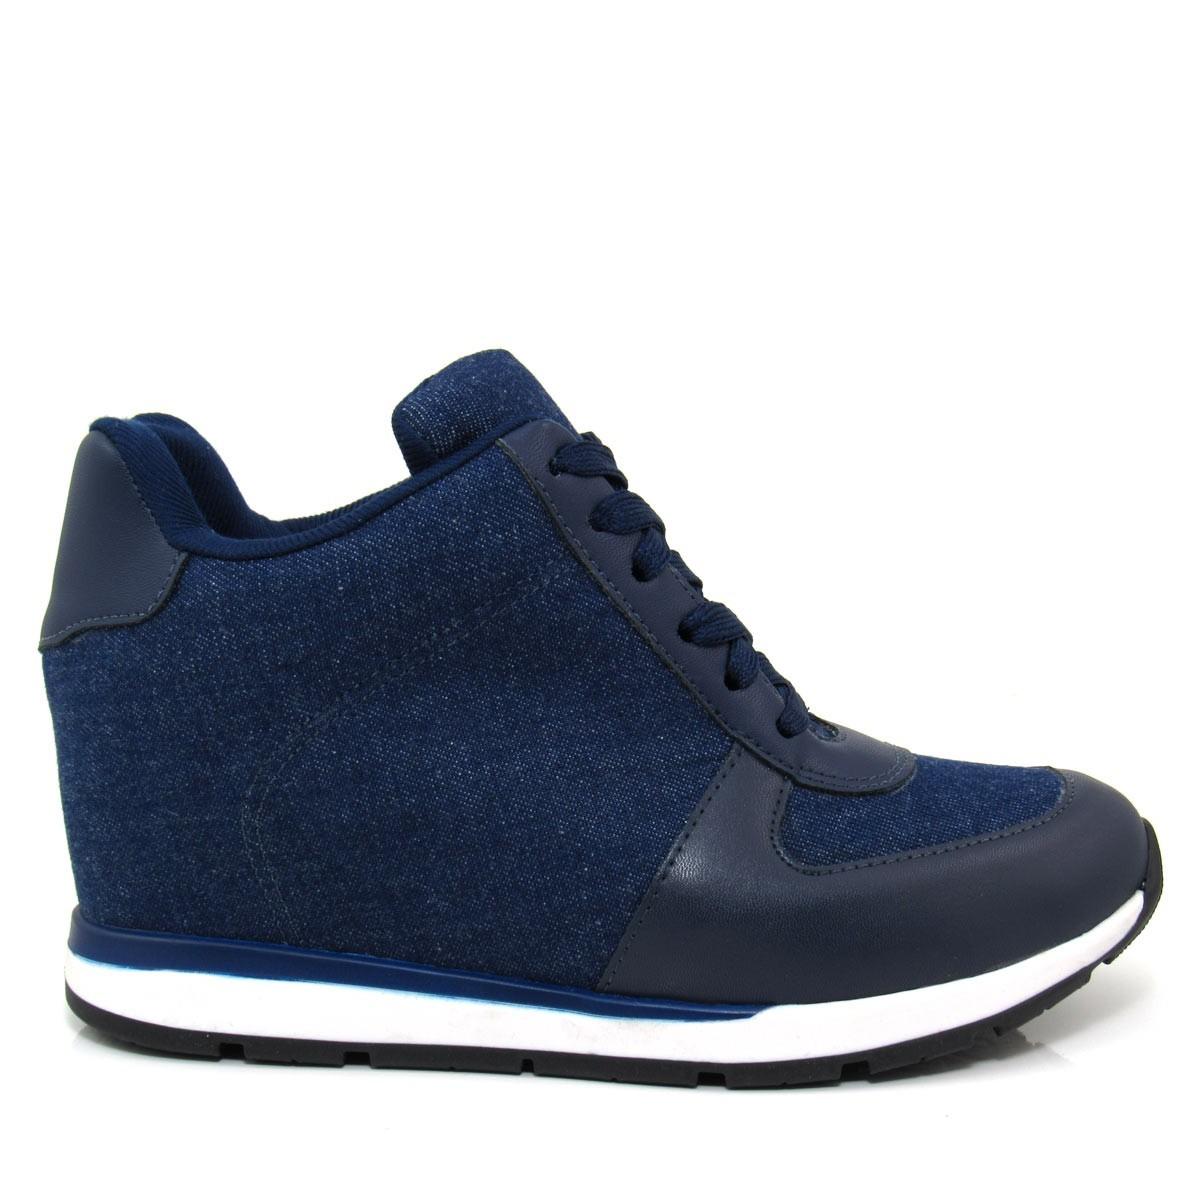 dd27068fbd9 Tênis Sneaker Feminino Vizzano 1226102 Jeans Salto Embutido - R  89 ...